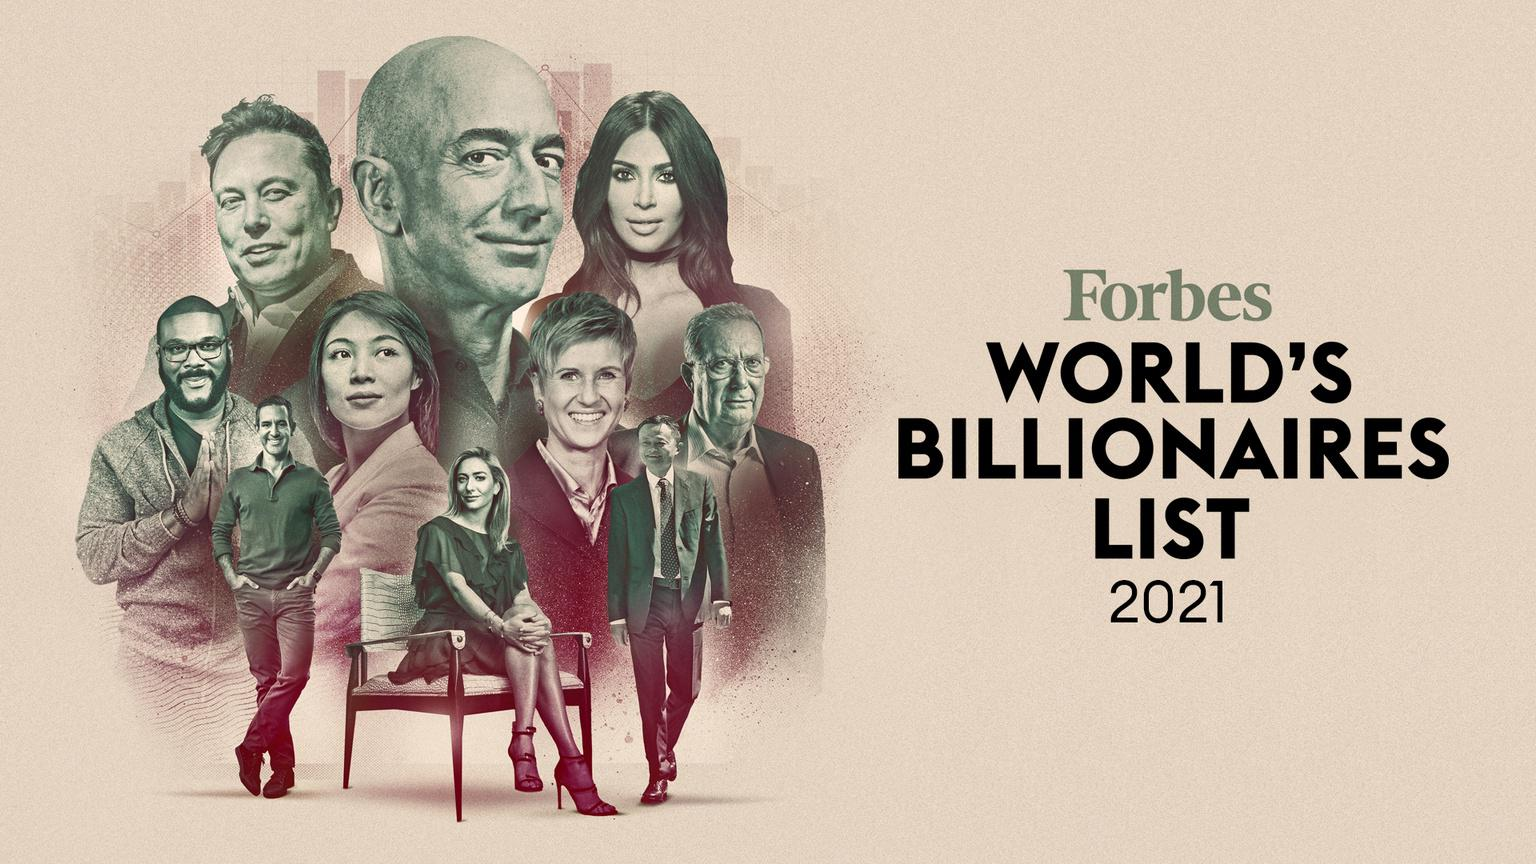 Forbes 2021 Billionaires